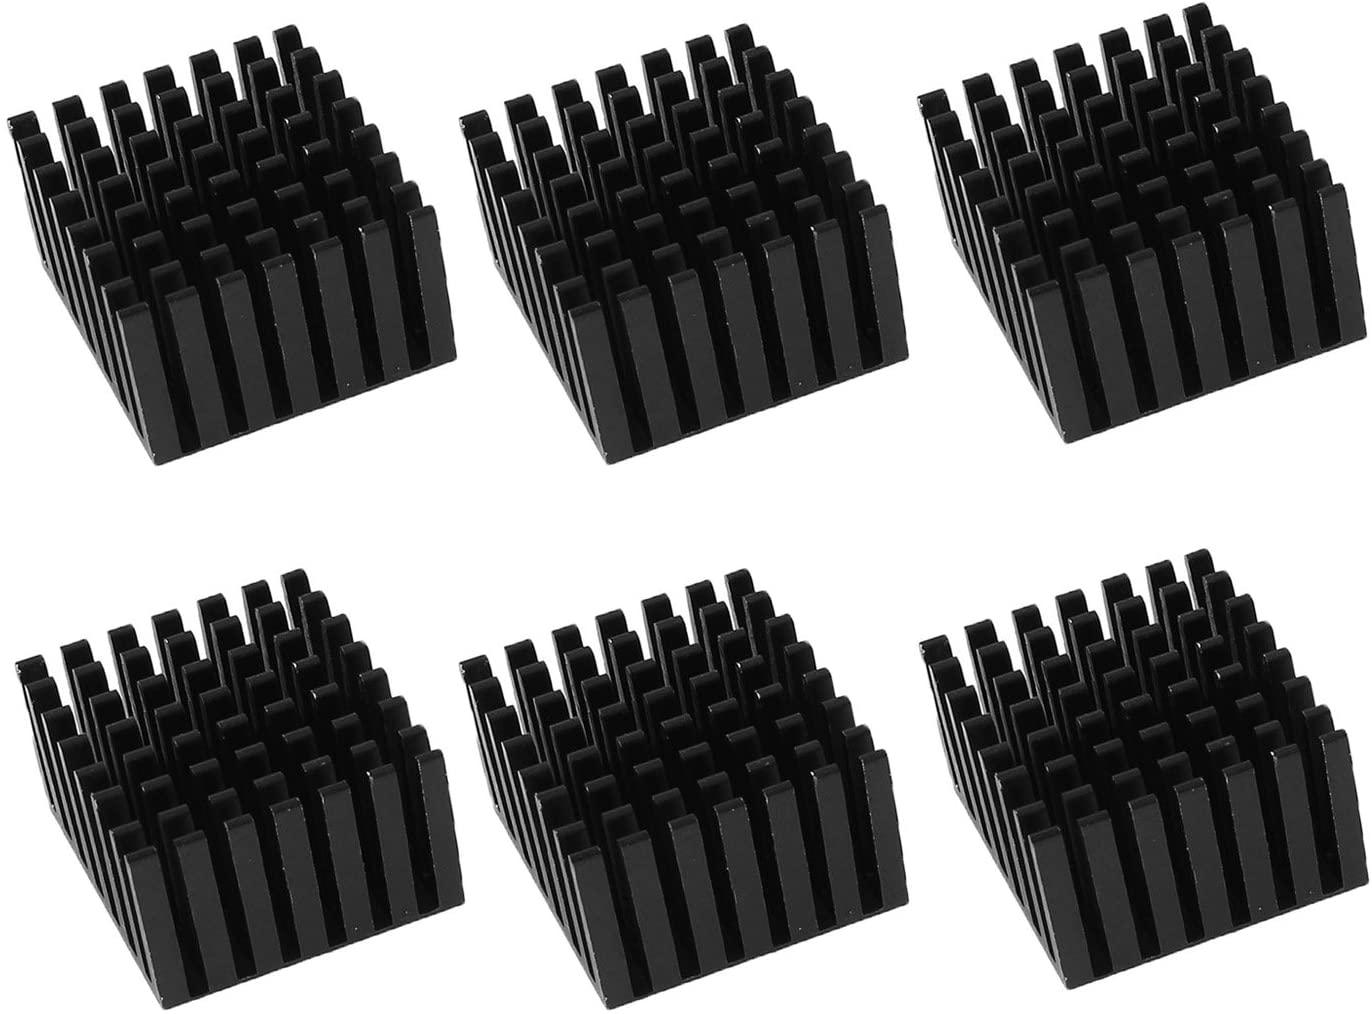 Antrader 6pcs 28 x 28 x 20mm Aluminum Heatsink Cooling Fin Black